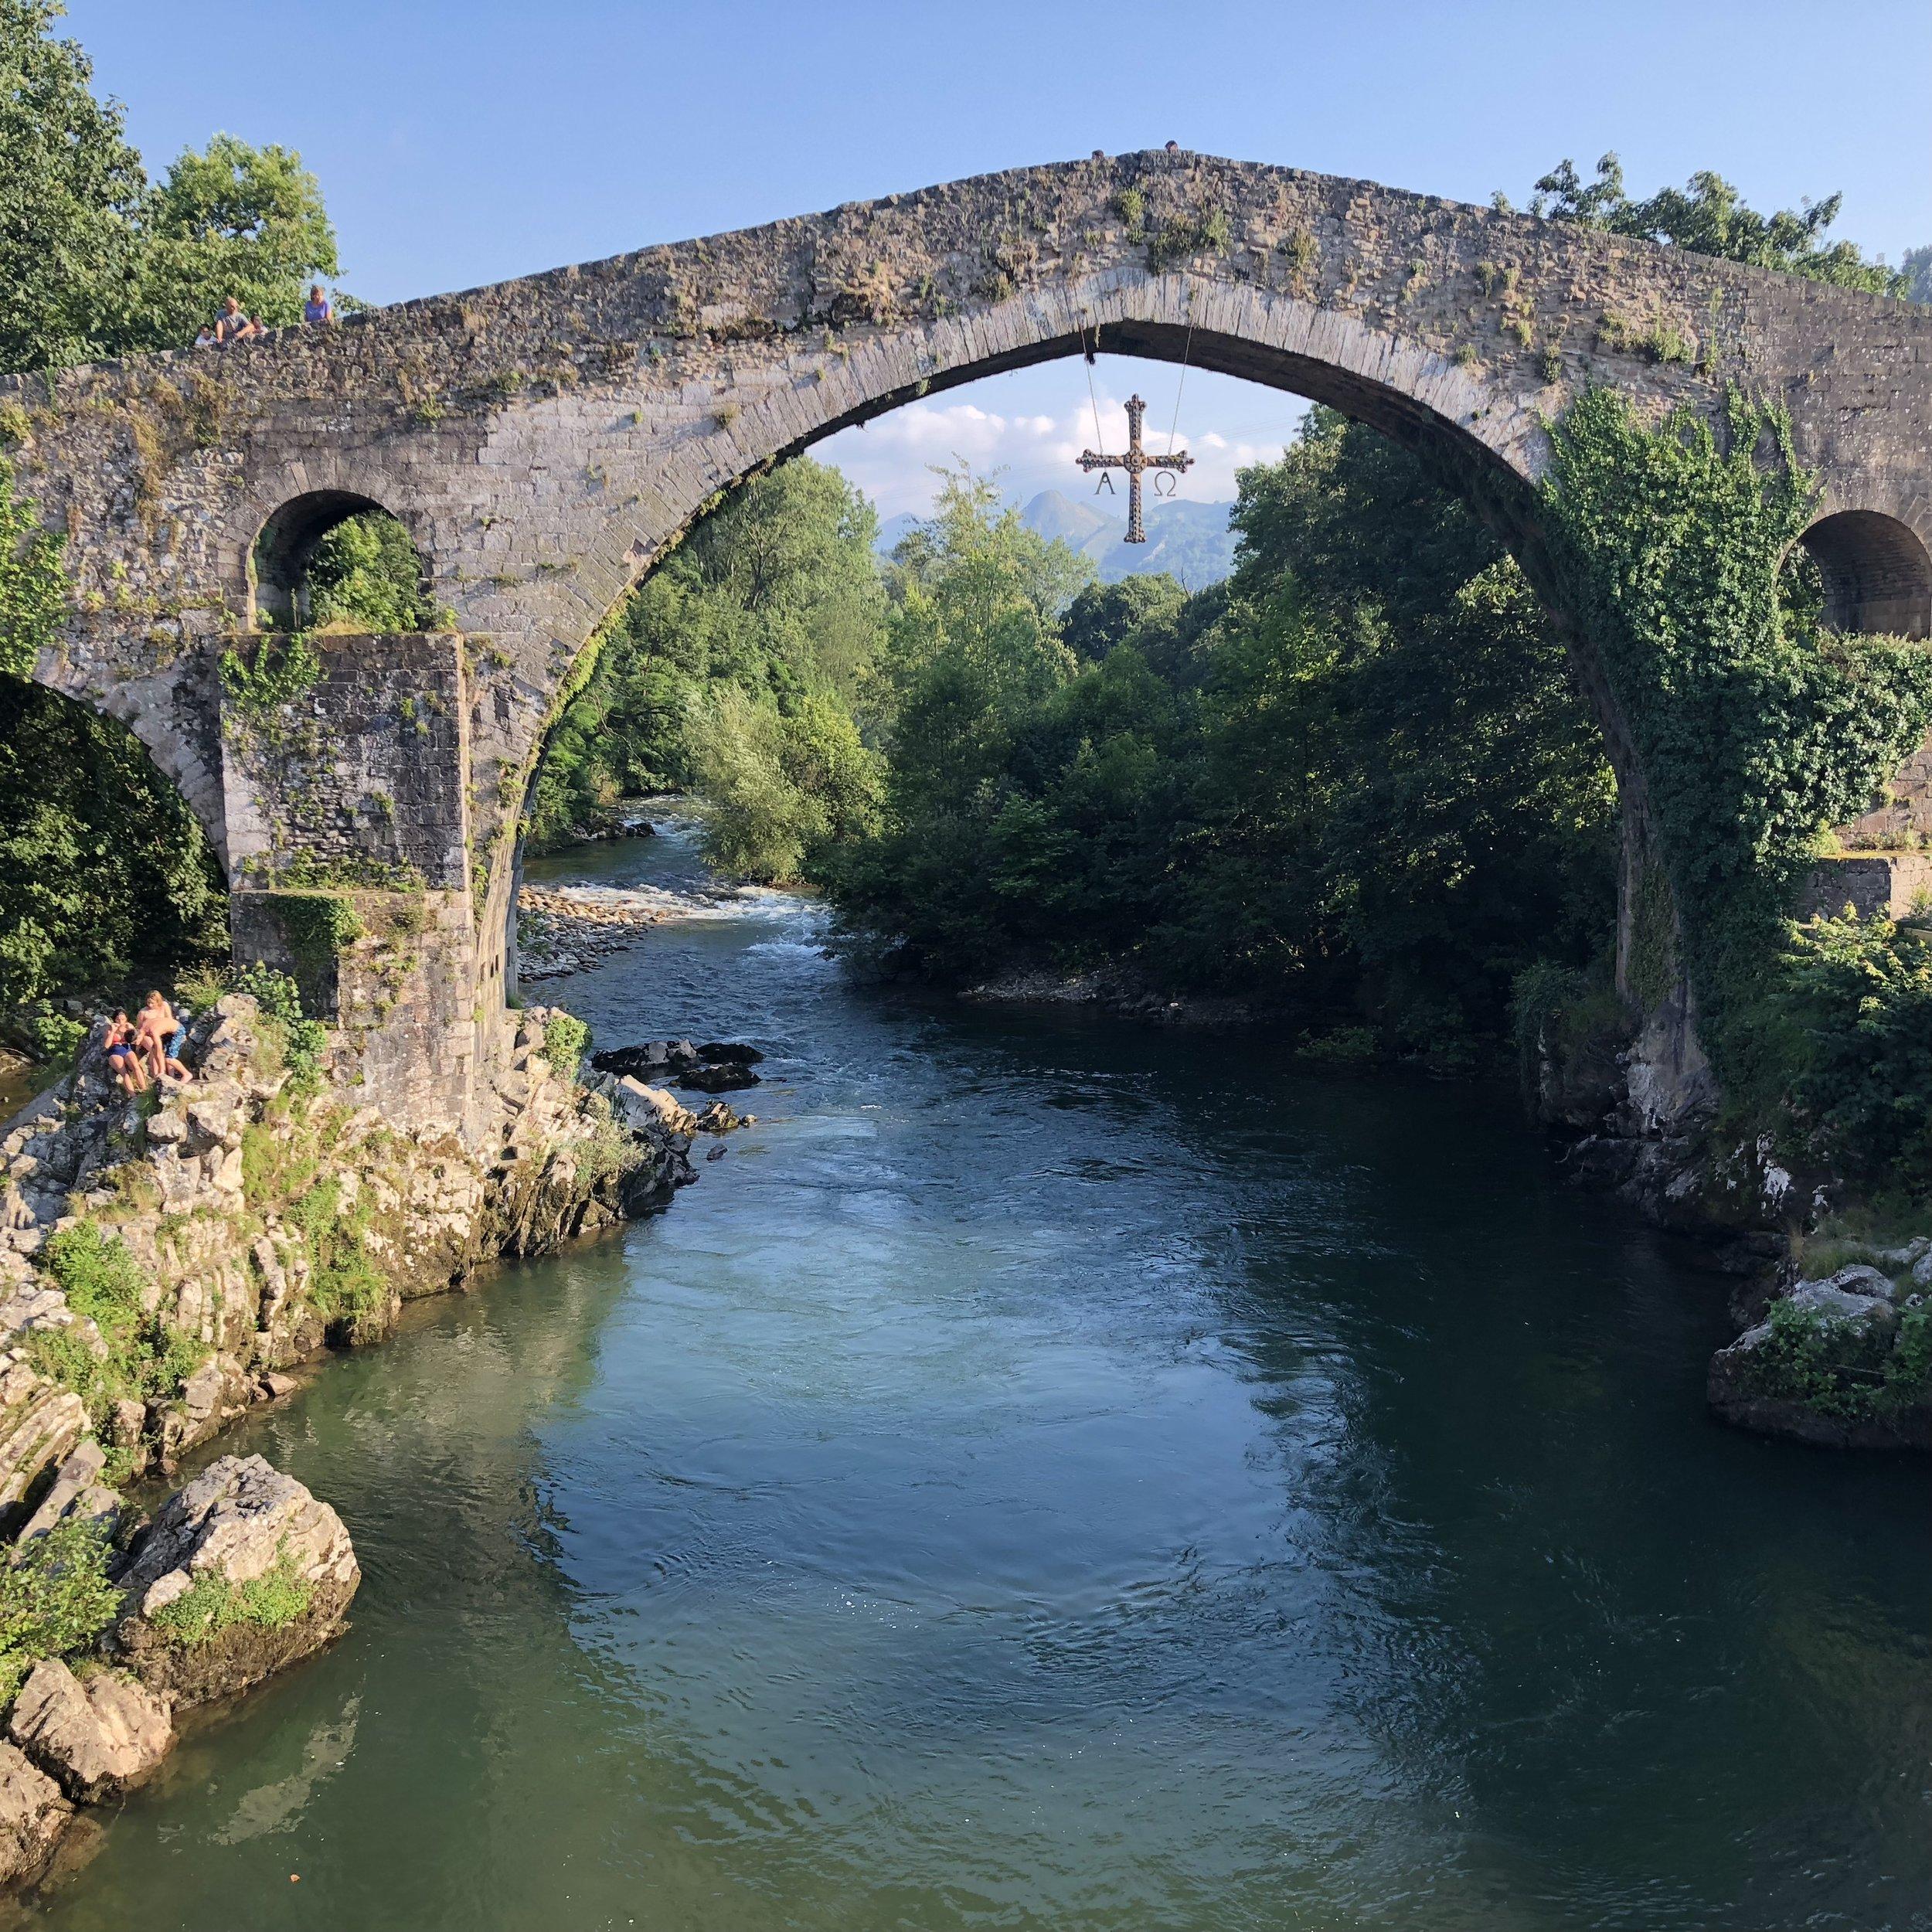 The so-called Roman Bridge of Cangas de Onis.